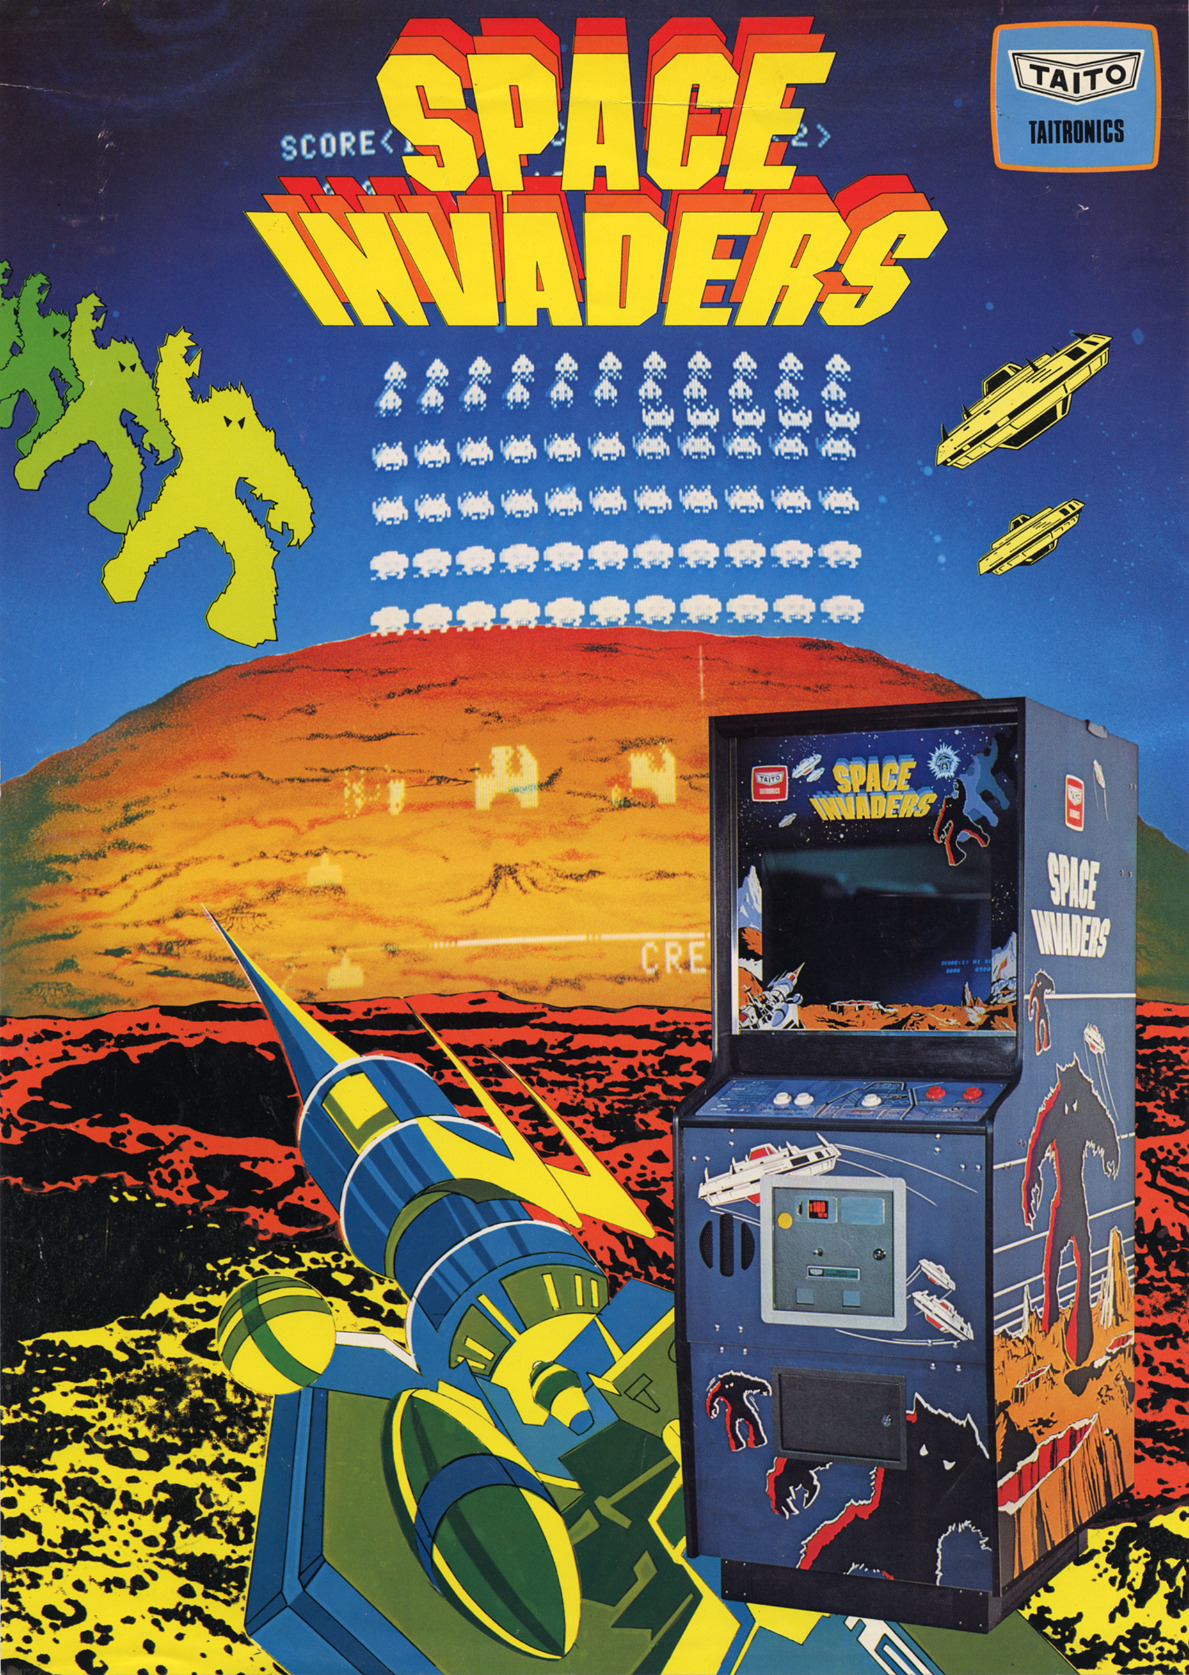 Space Invaders (Video Game 1978) - IMDb